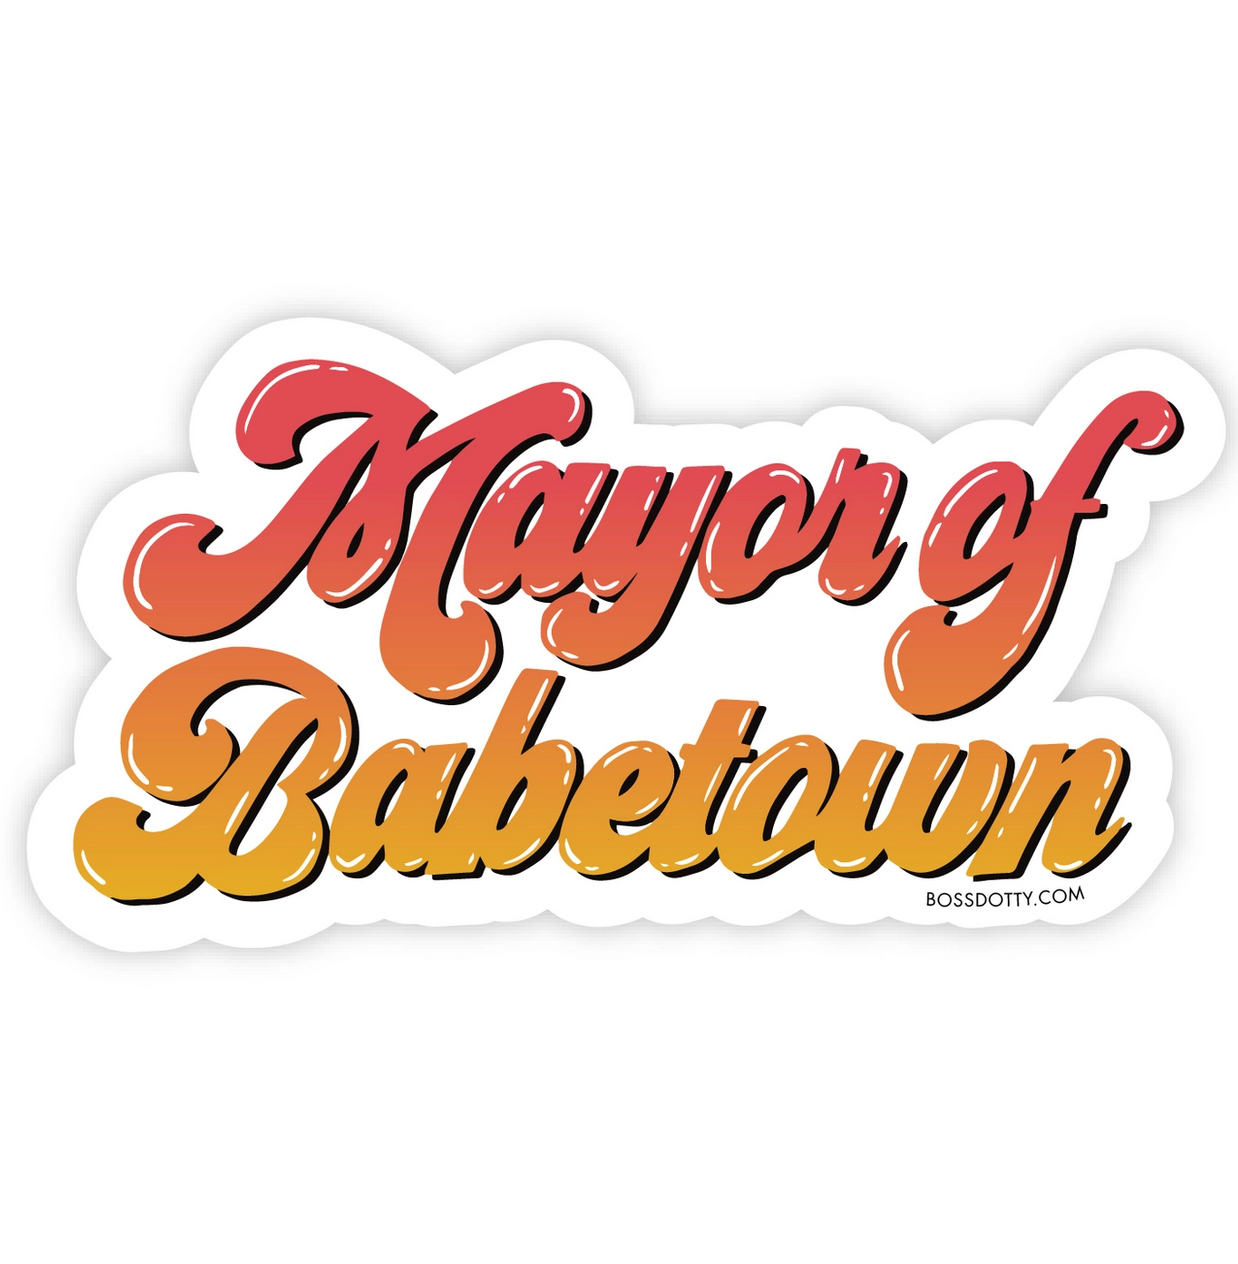 Boss Dotty Mayor of Babetown Sticker